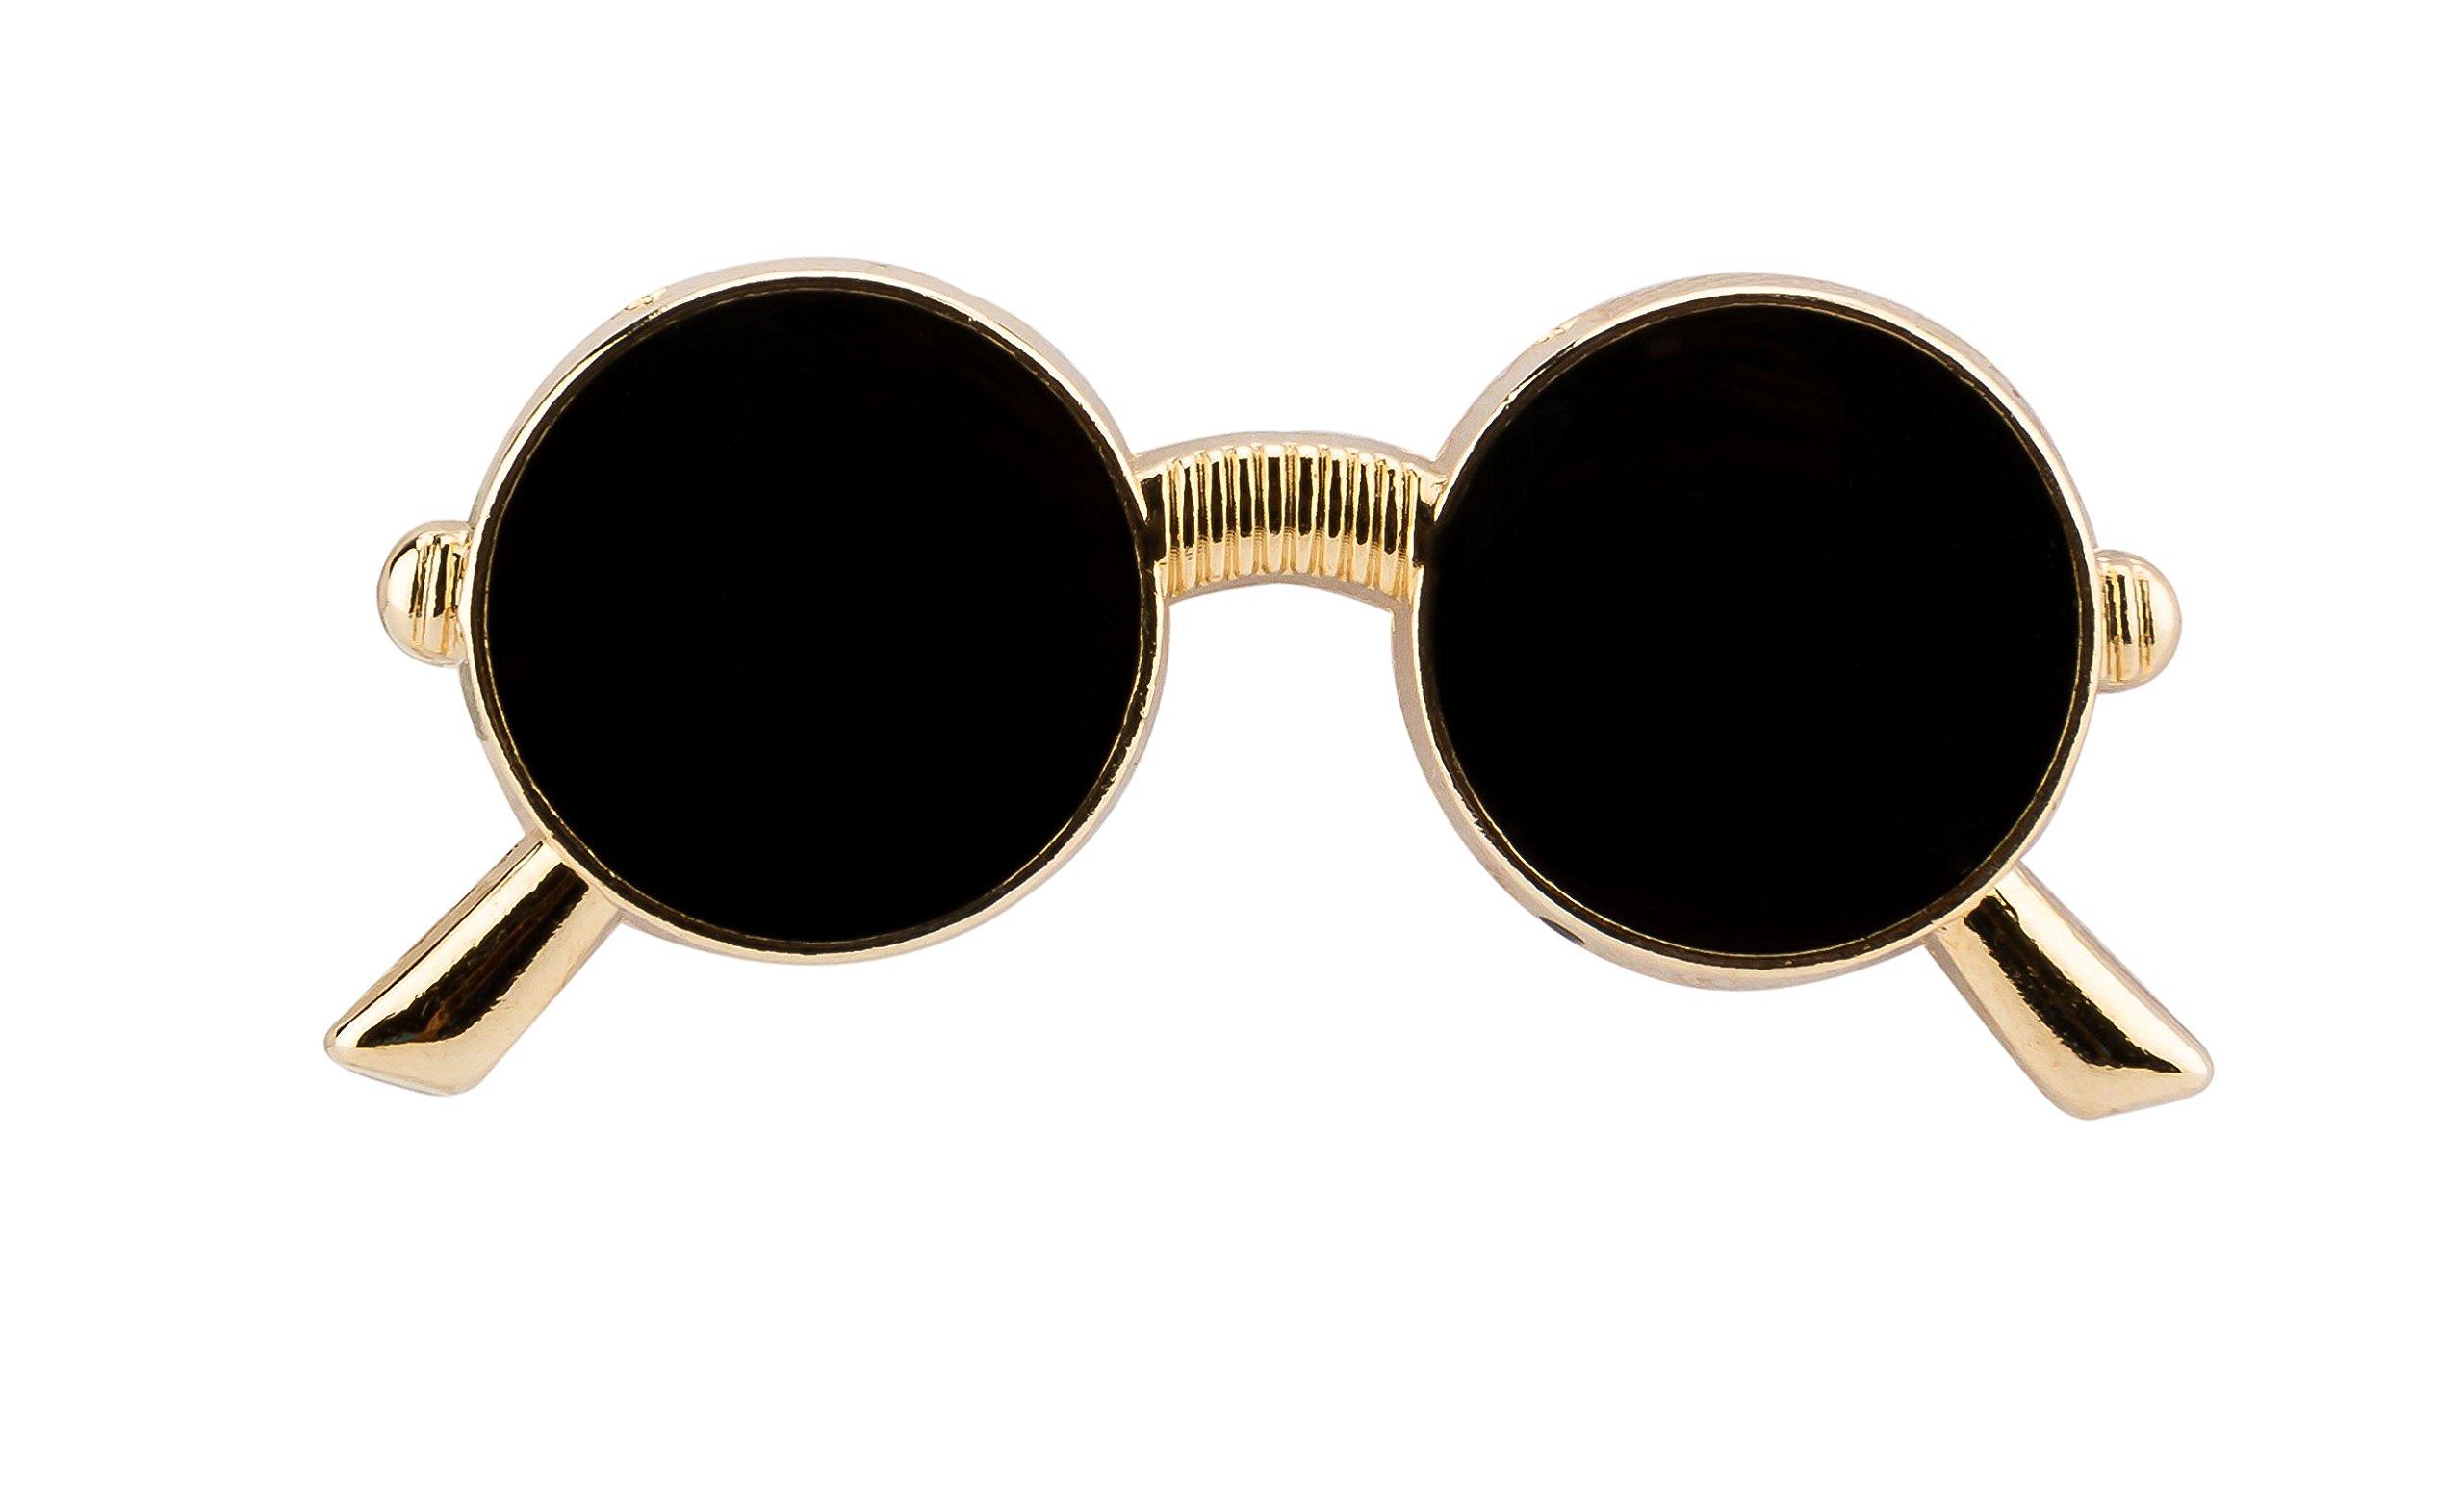 Knighthood Men's Sunglasses Lapel Pin/Brooch